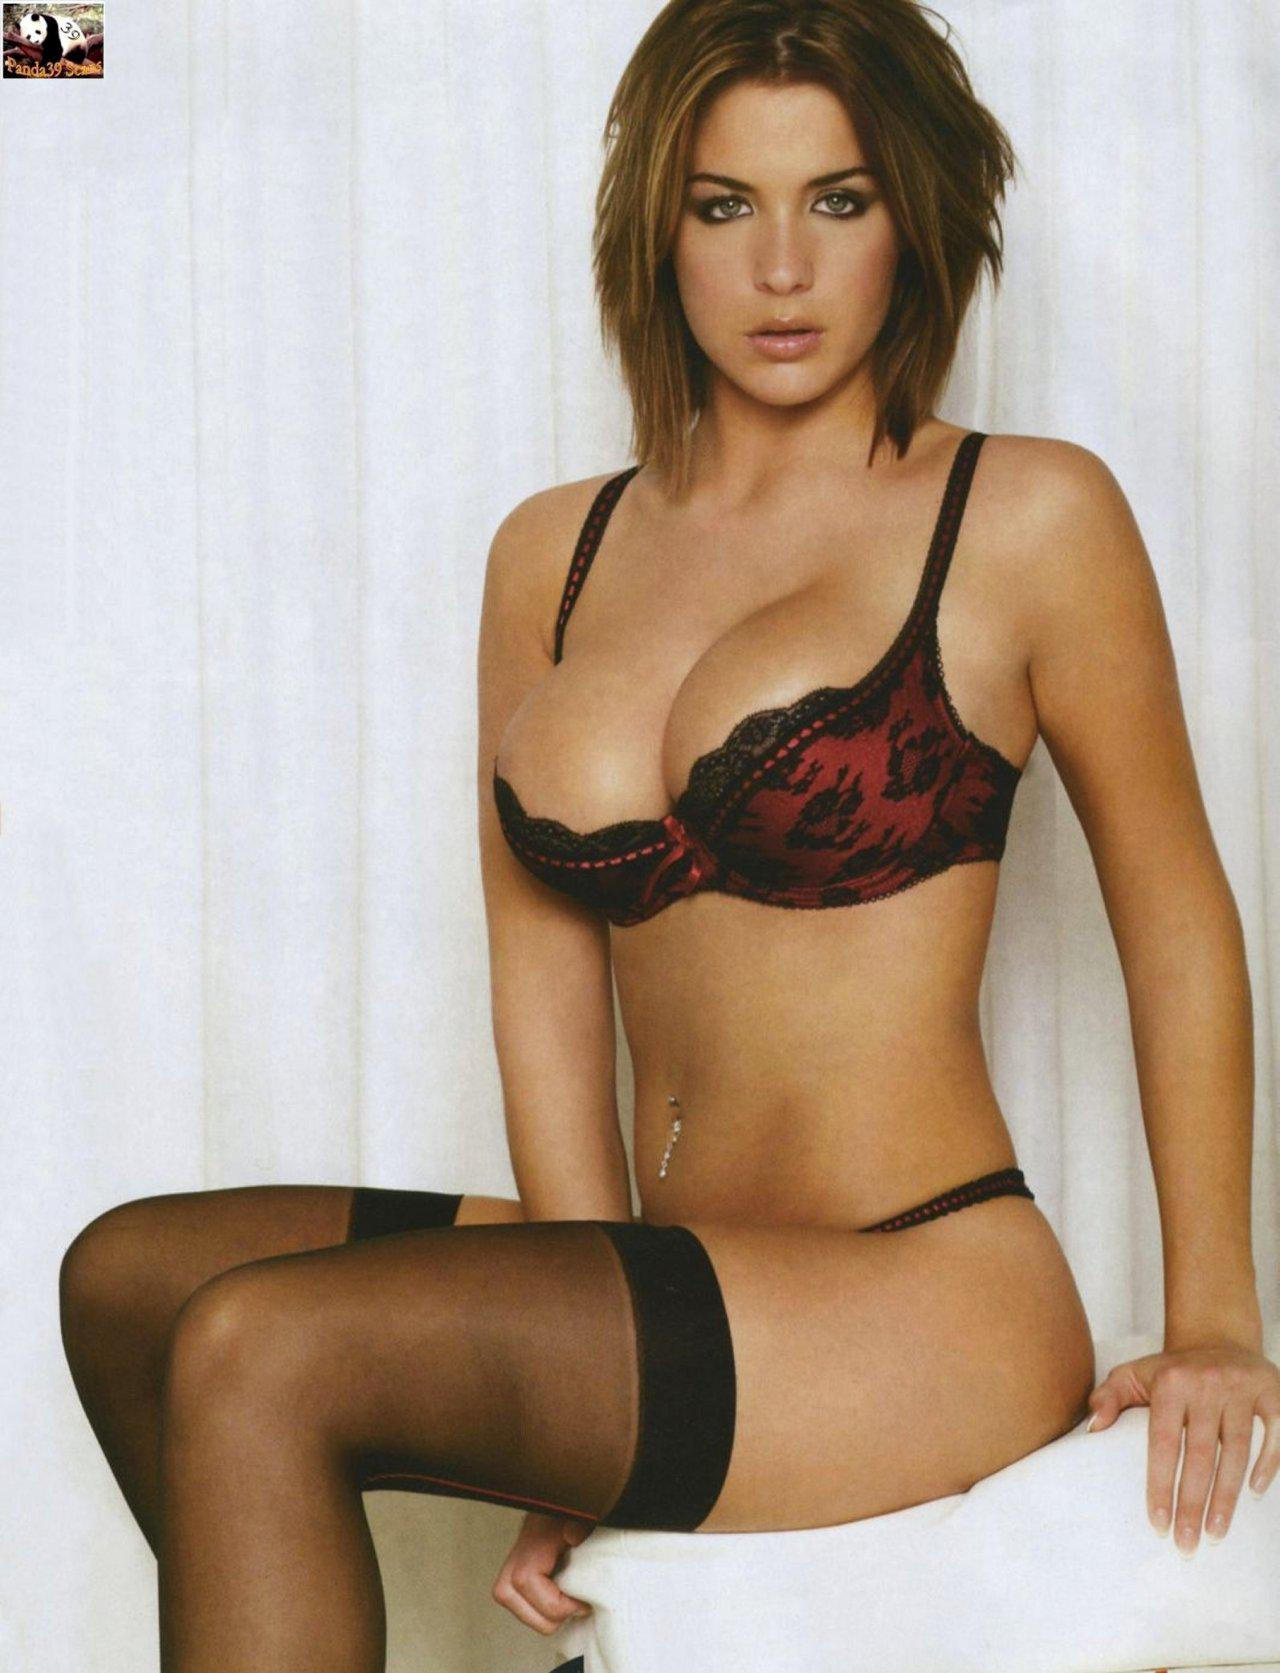 Gemma Atkinson desnuda - Página 2 fotos desnuda,